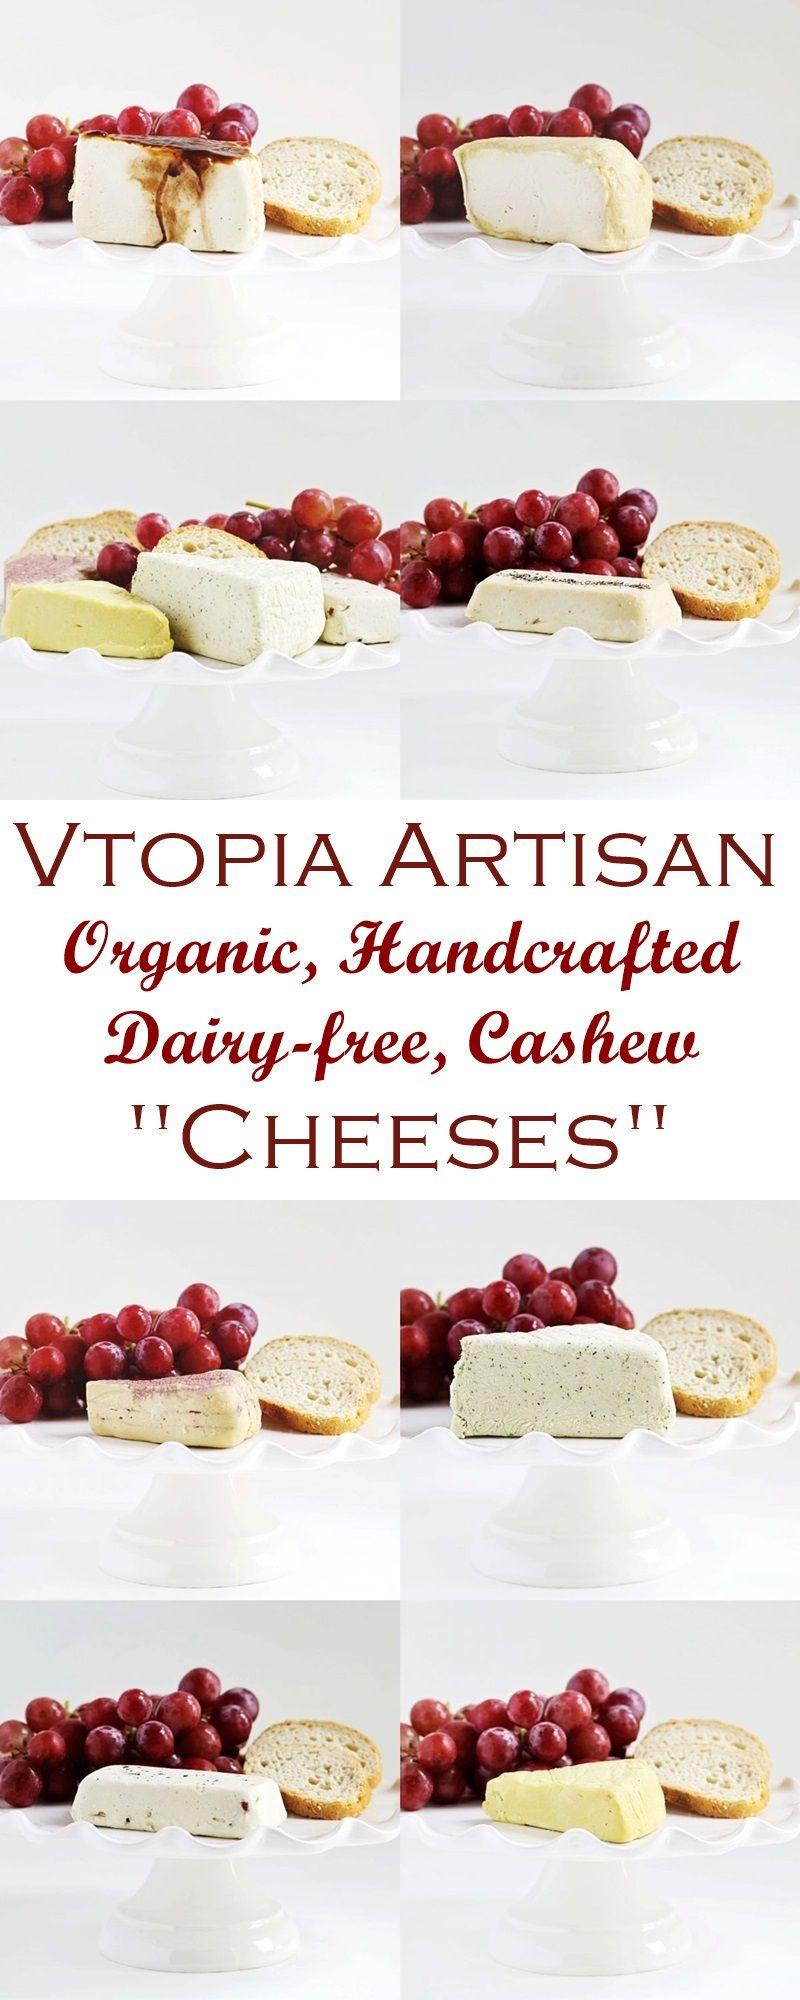 Vtopian Artisan Cheeses Reviews And Info Dairy Free Vegan Dairy Free Gluten Free Shopping Dairy Free Cheese